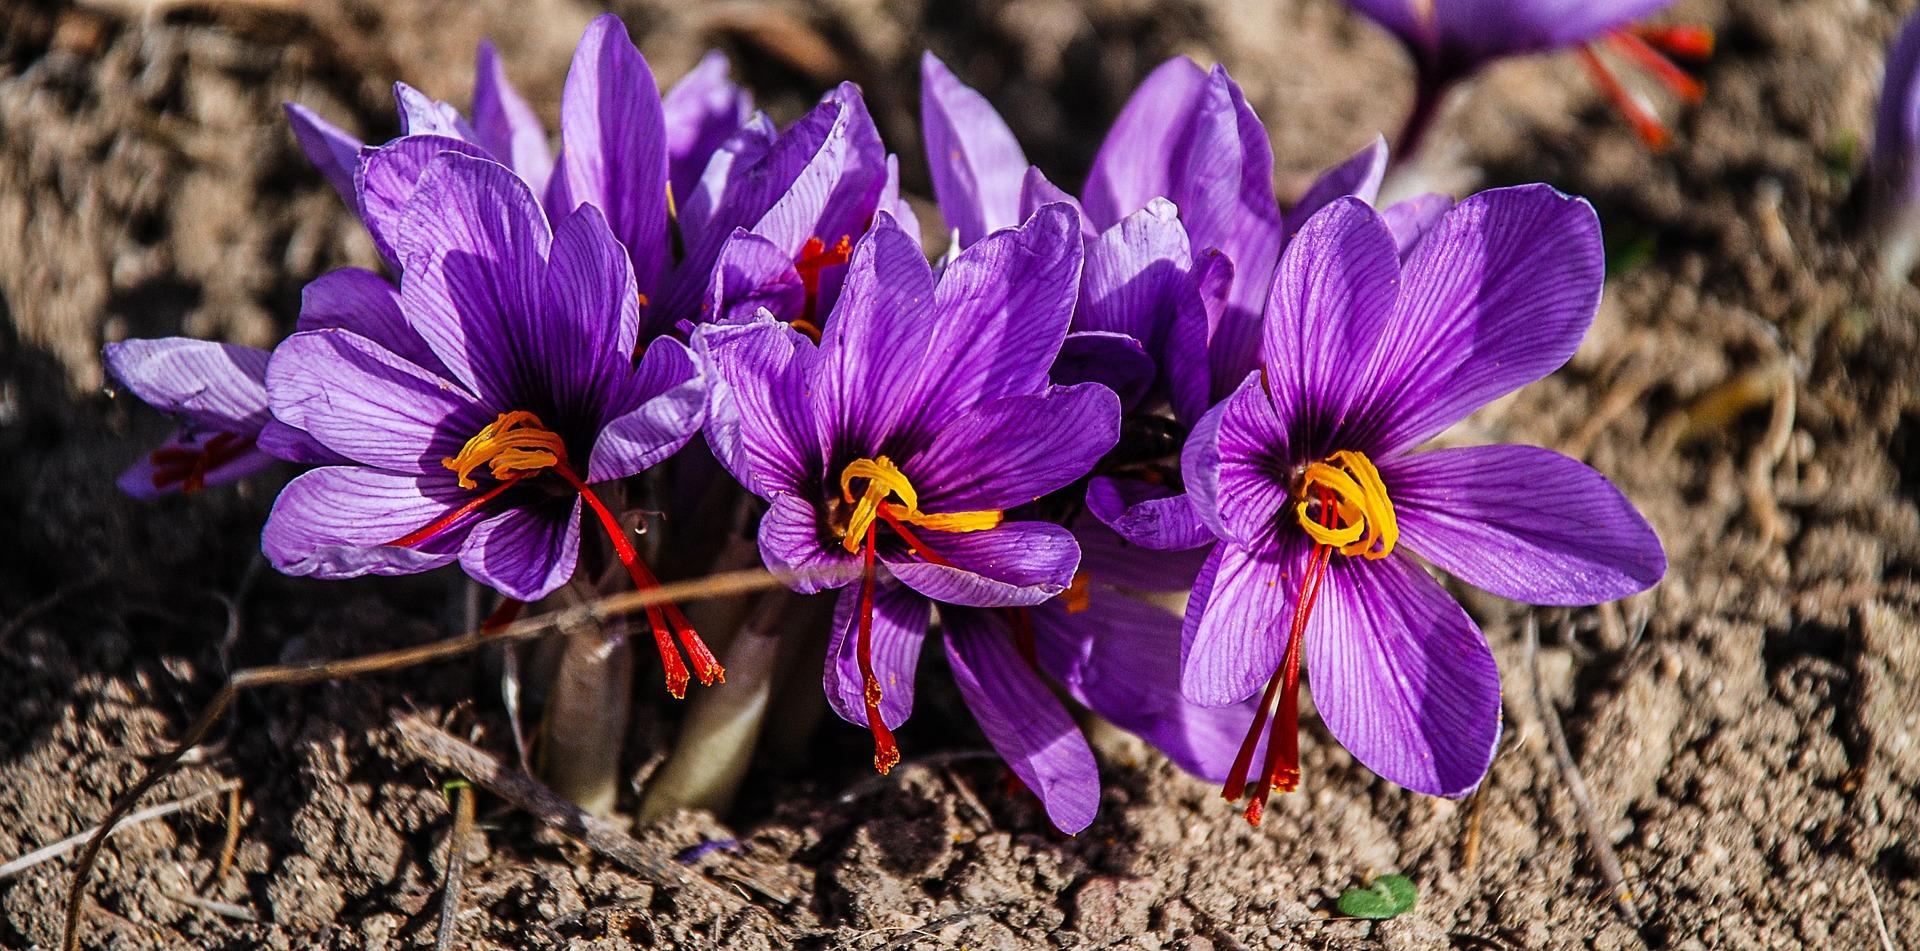 Saffron comes from the crocus flower, specifically the Crocus sativus.